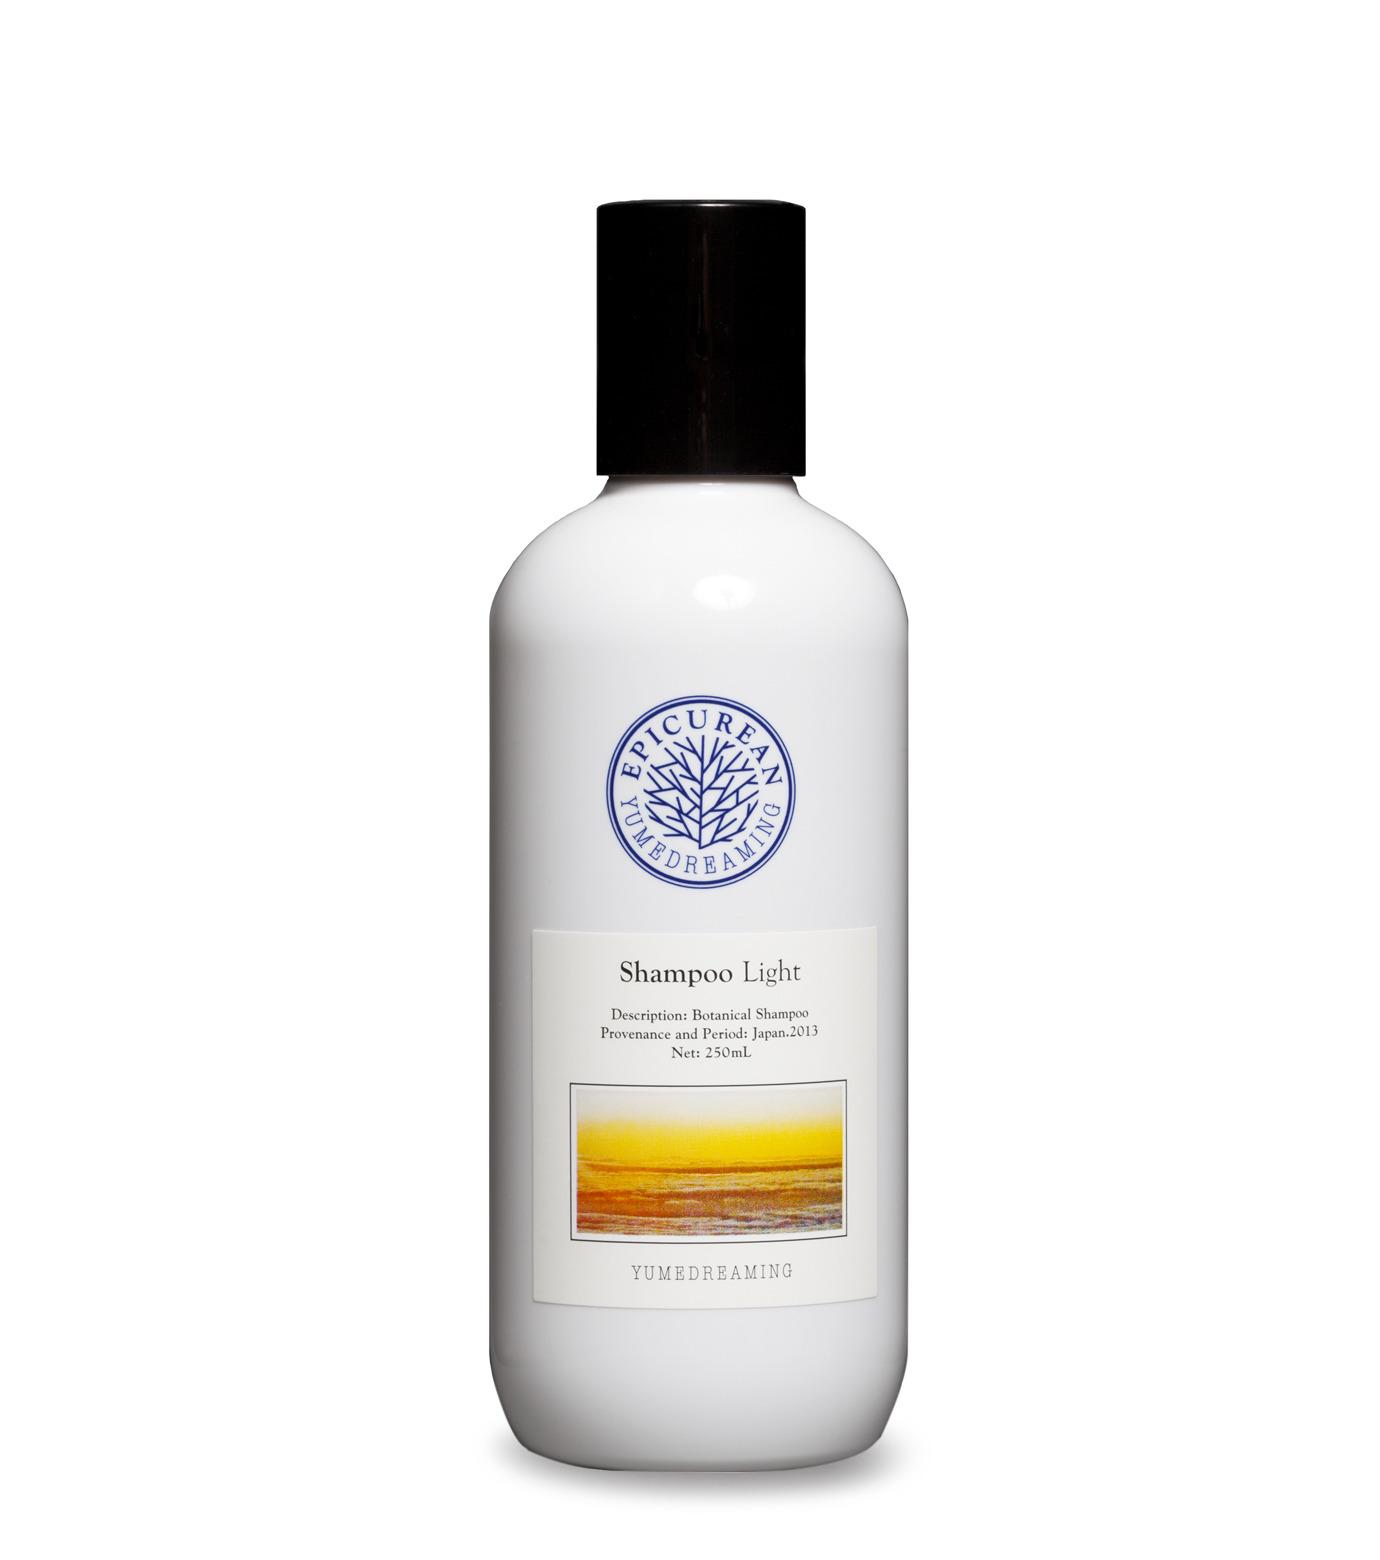 Yumedreaming Epicurean(ユメドリーミン エピキュリアン)のShampoo Light 250ml-WHITE(HAIR-CARE/HAIR-CARE)-ESHL-4 拡大詳細画像1